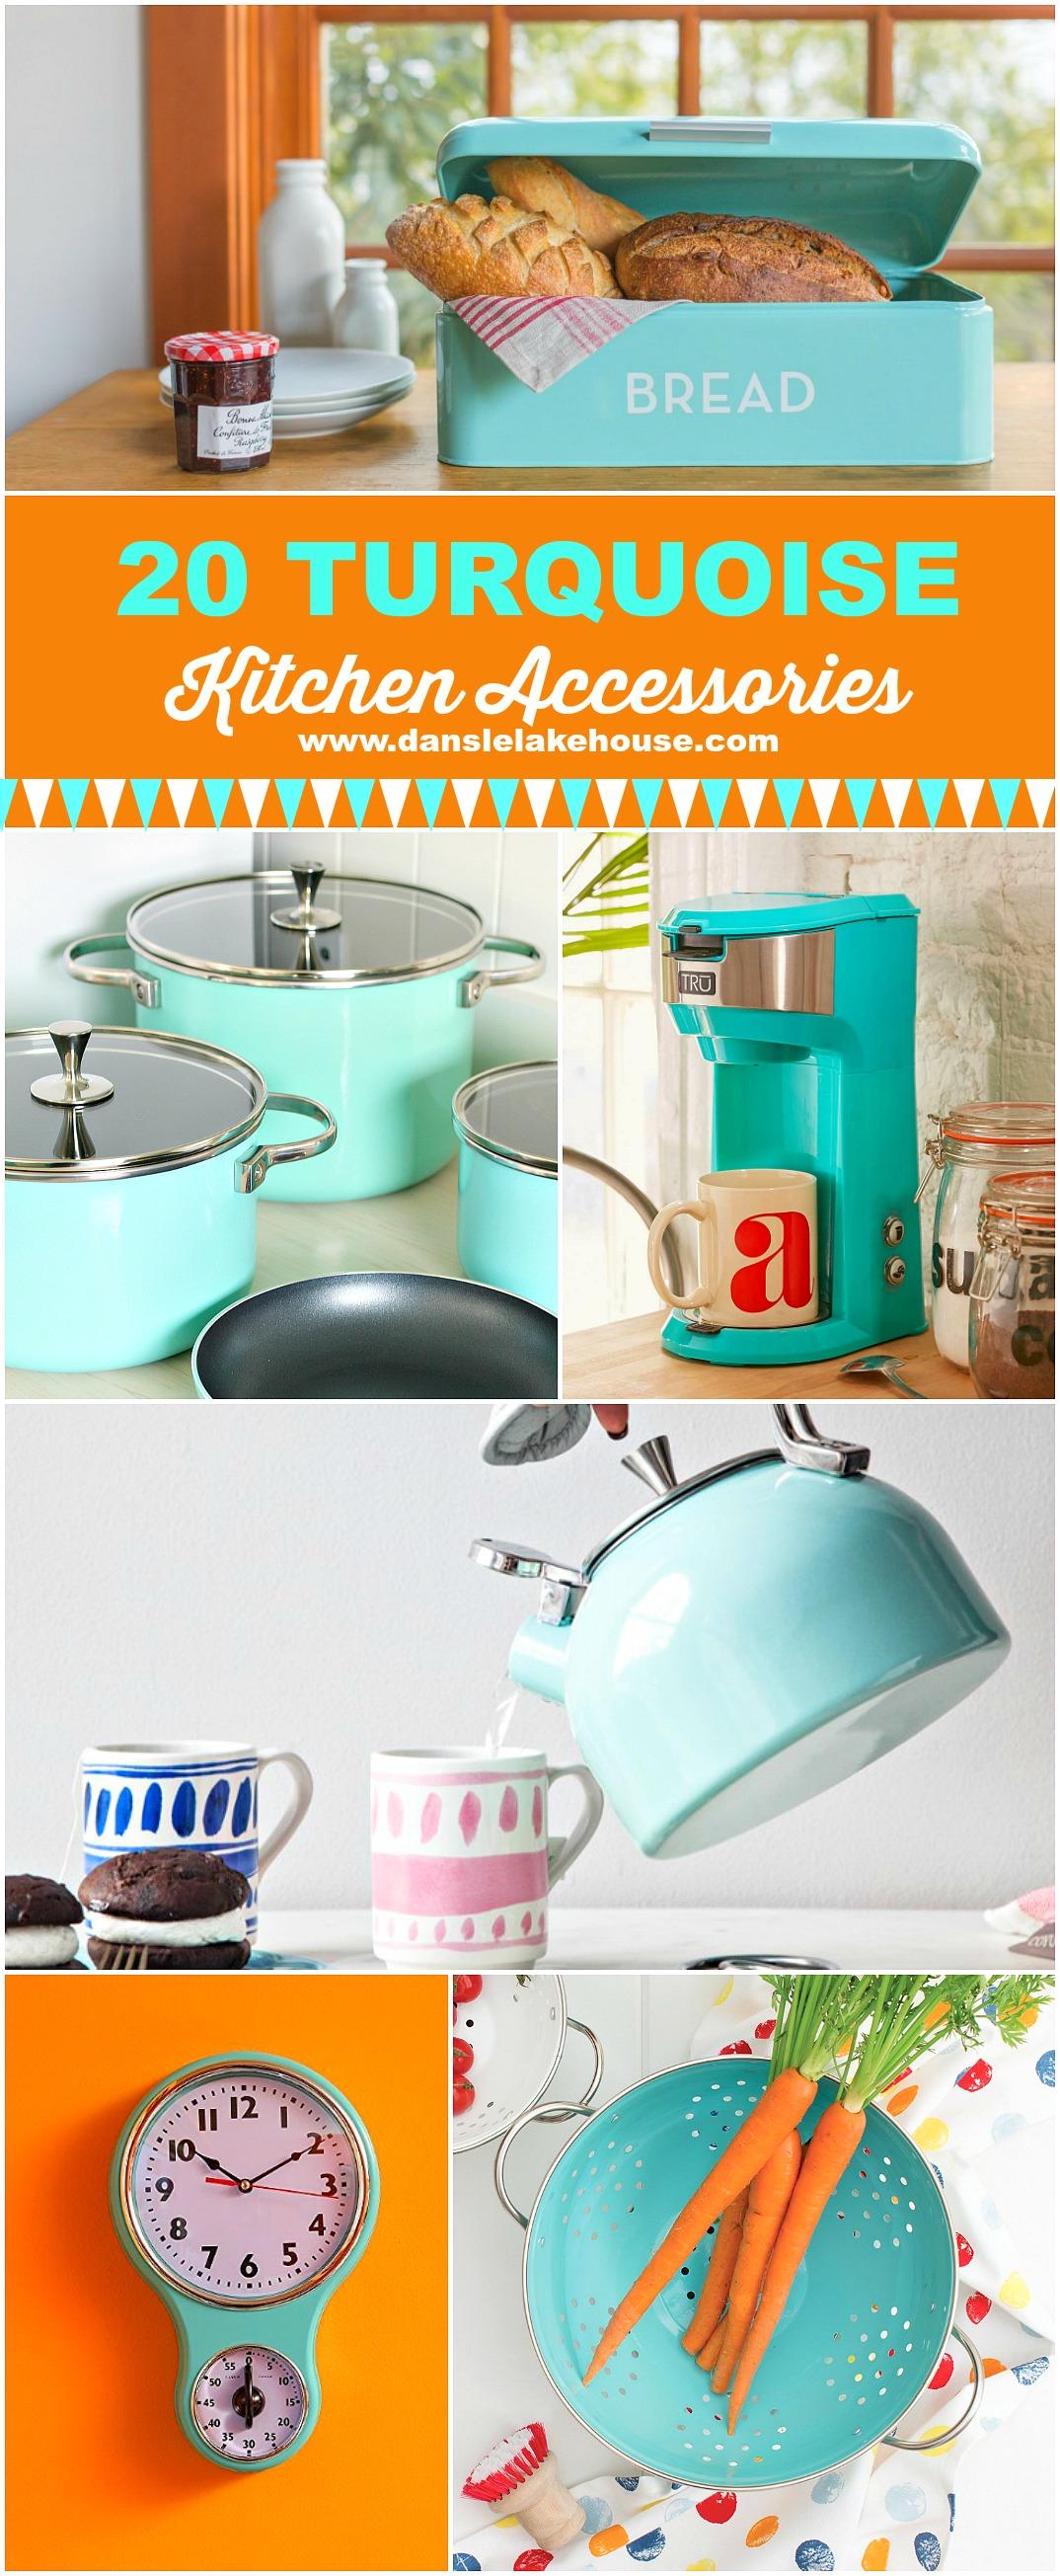 20 Gorgeous Turquoise Kitchen Accessories To Love Dans Le Lakehouse